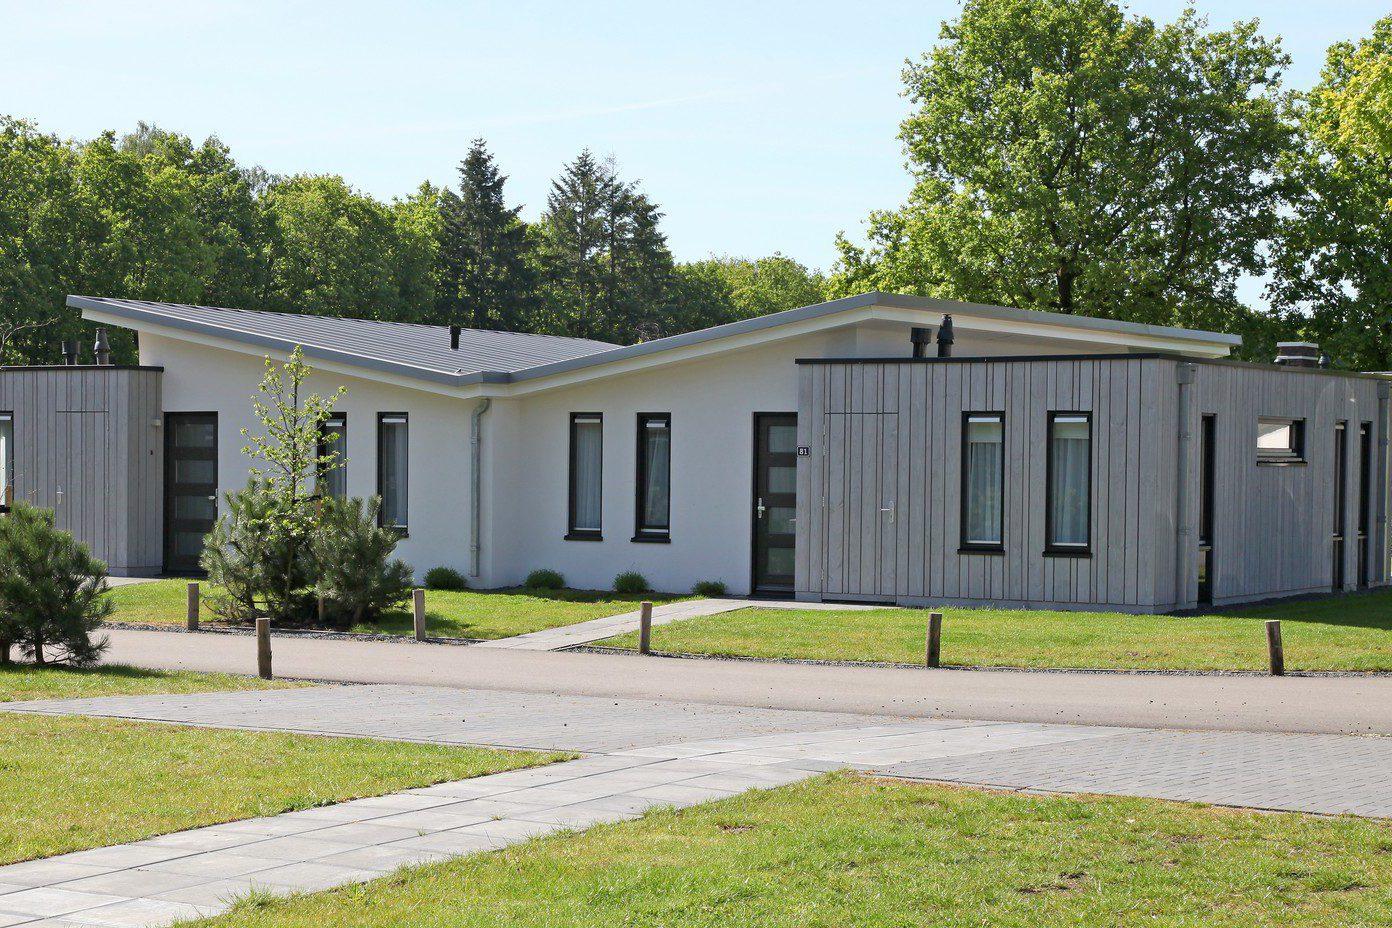 Recreatiepark De Amerongse Berg nr. 81